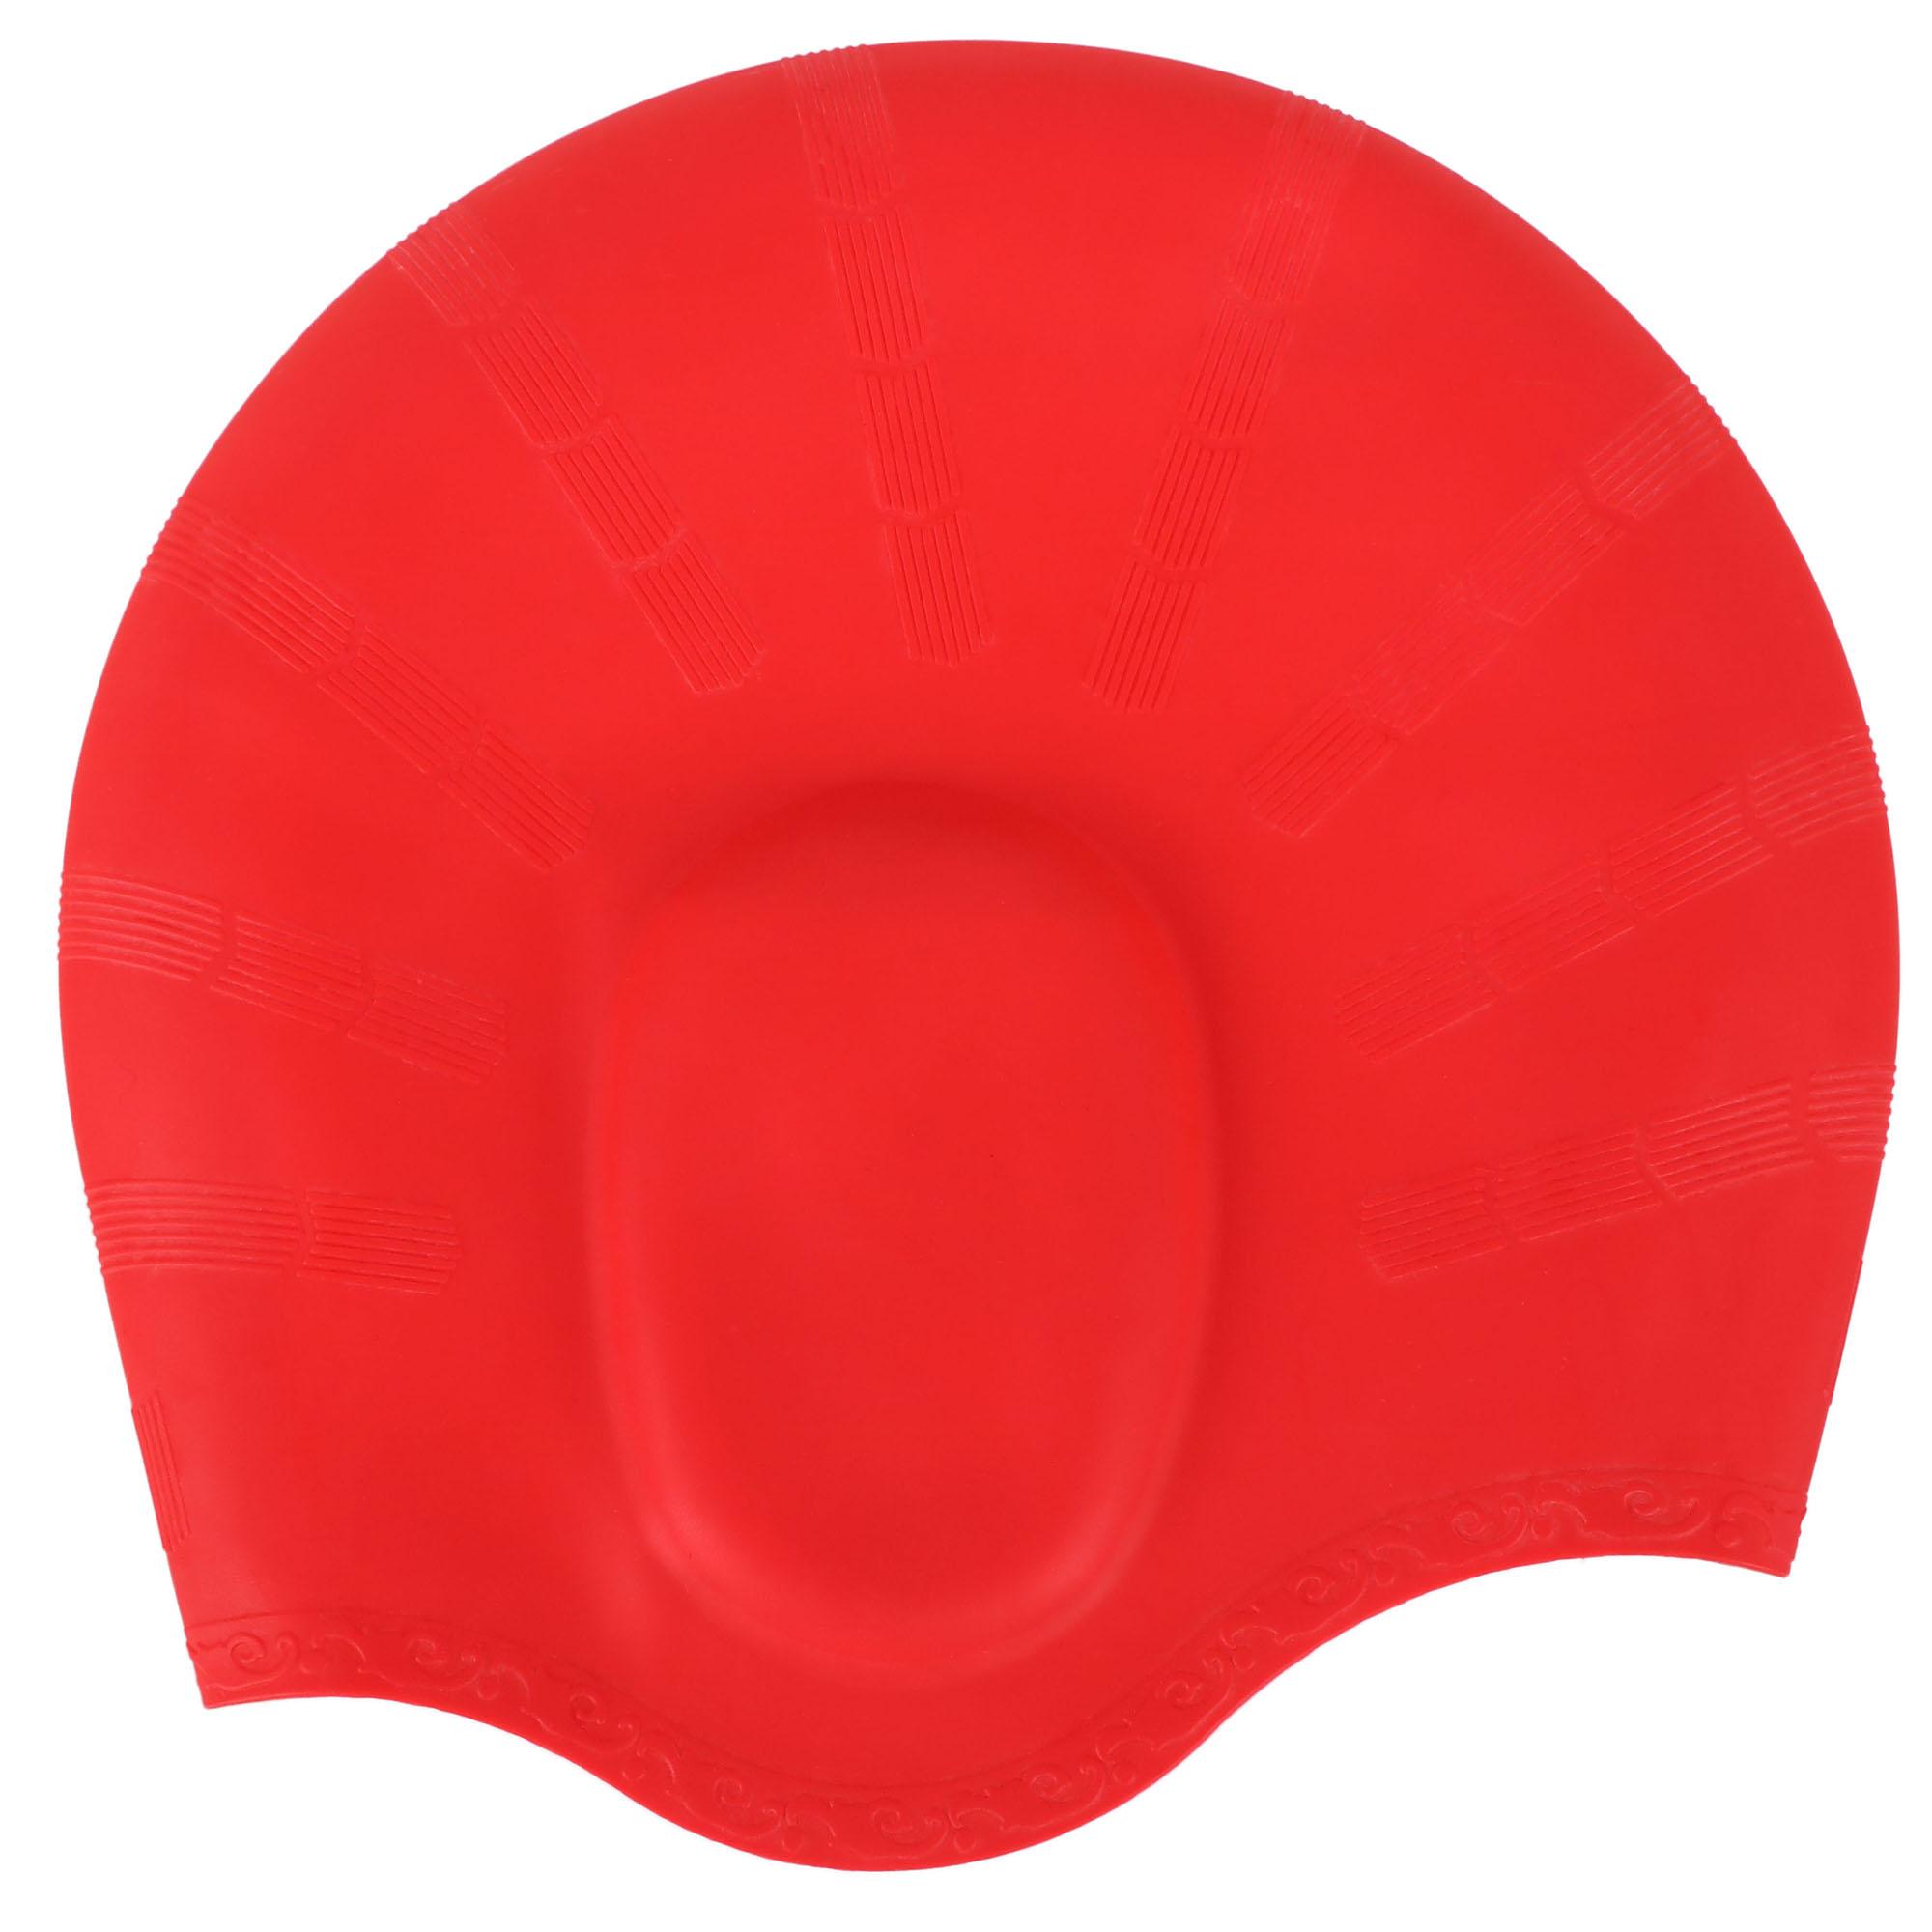 Men / Women's Athletic Swimwear Silicone Waterproof Swim Cap, Red